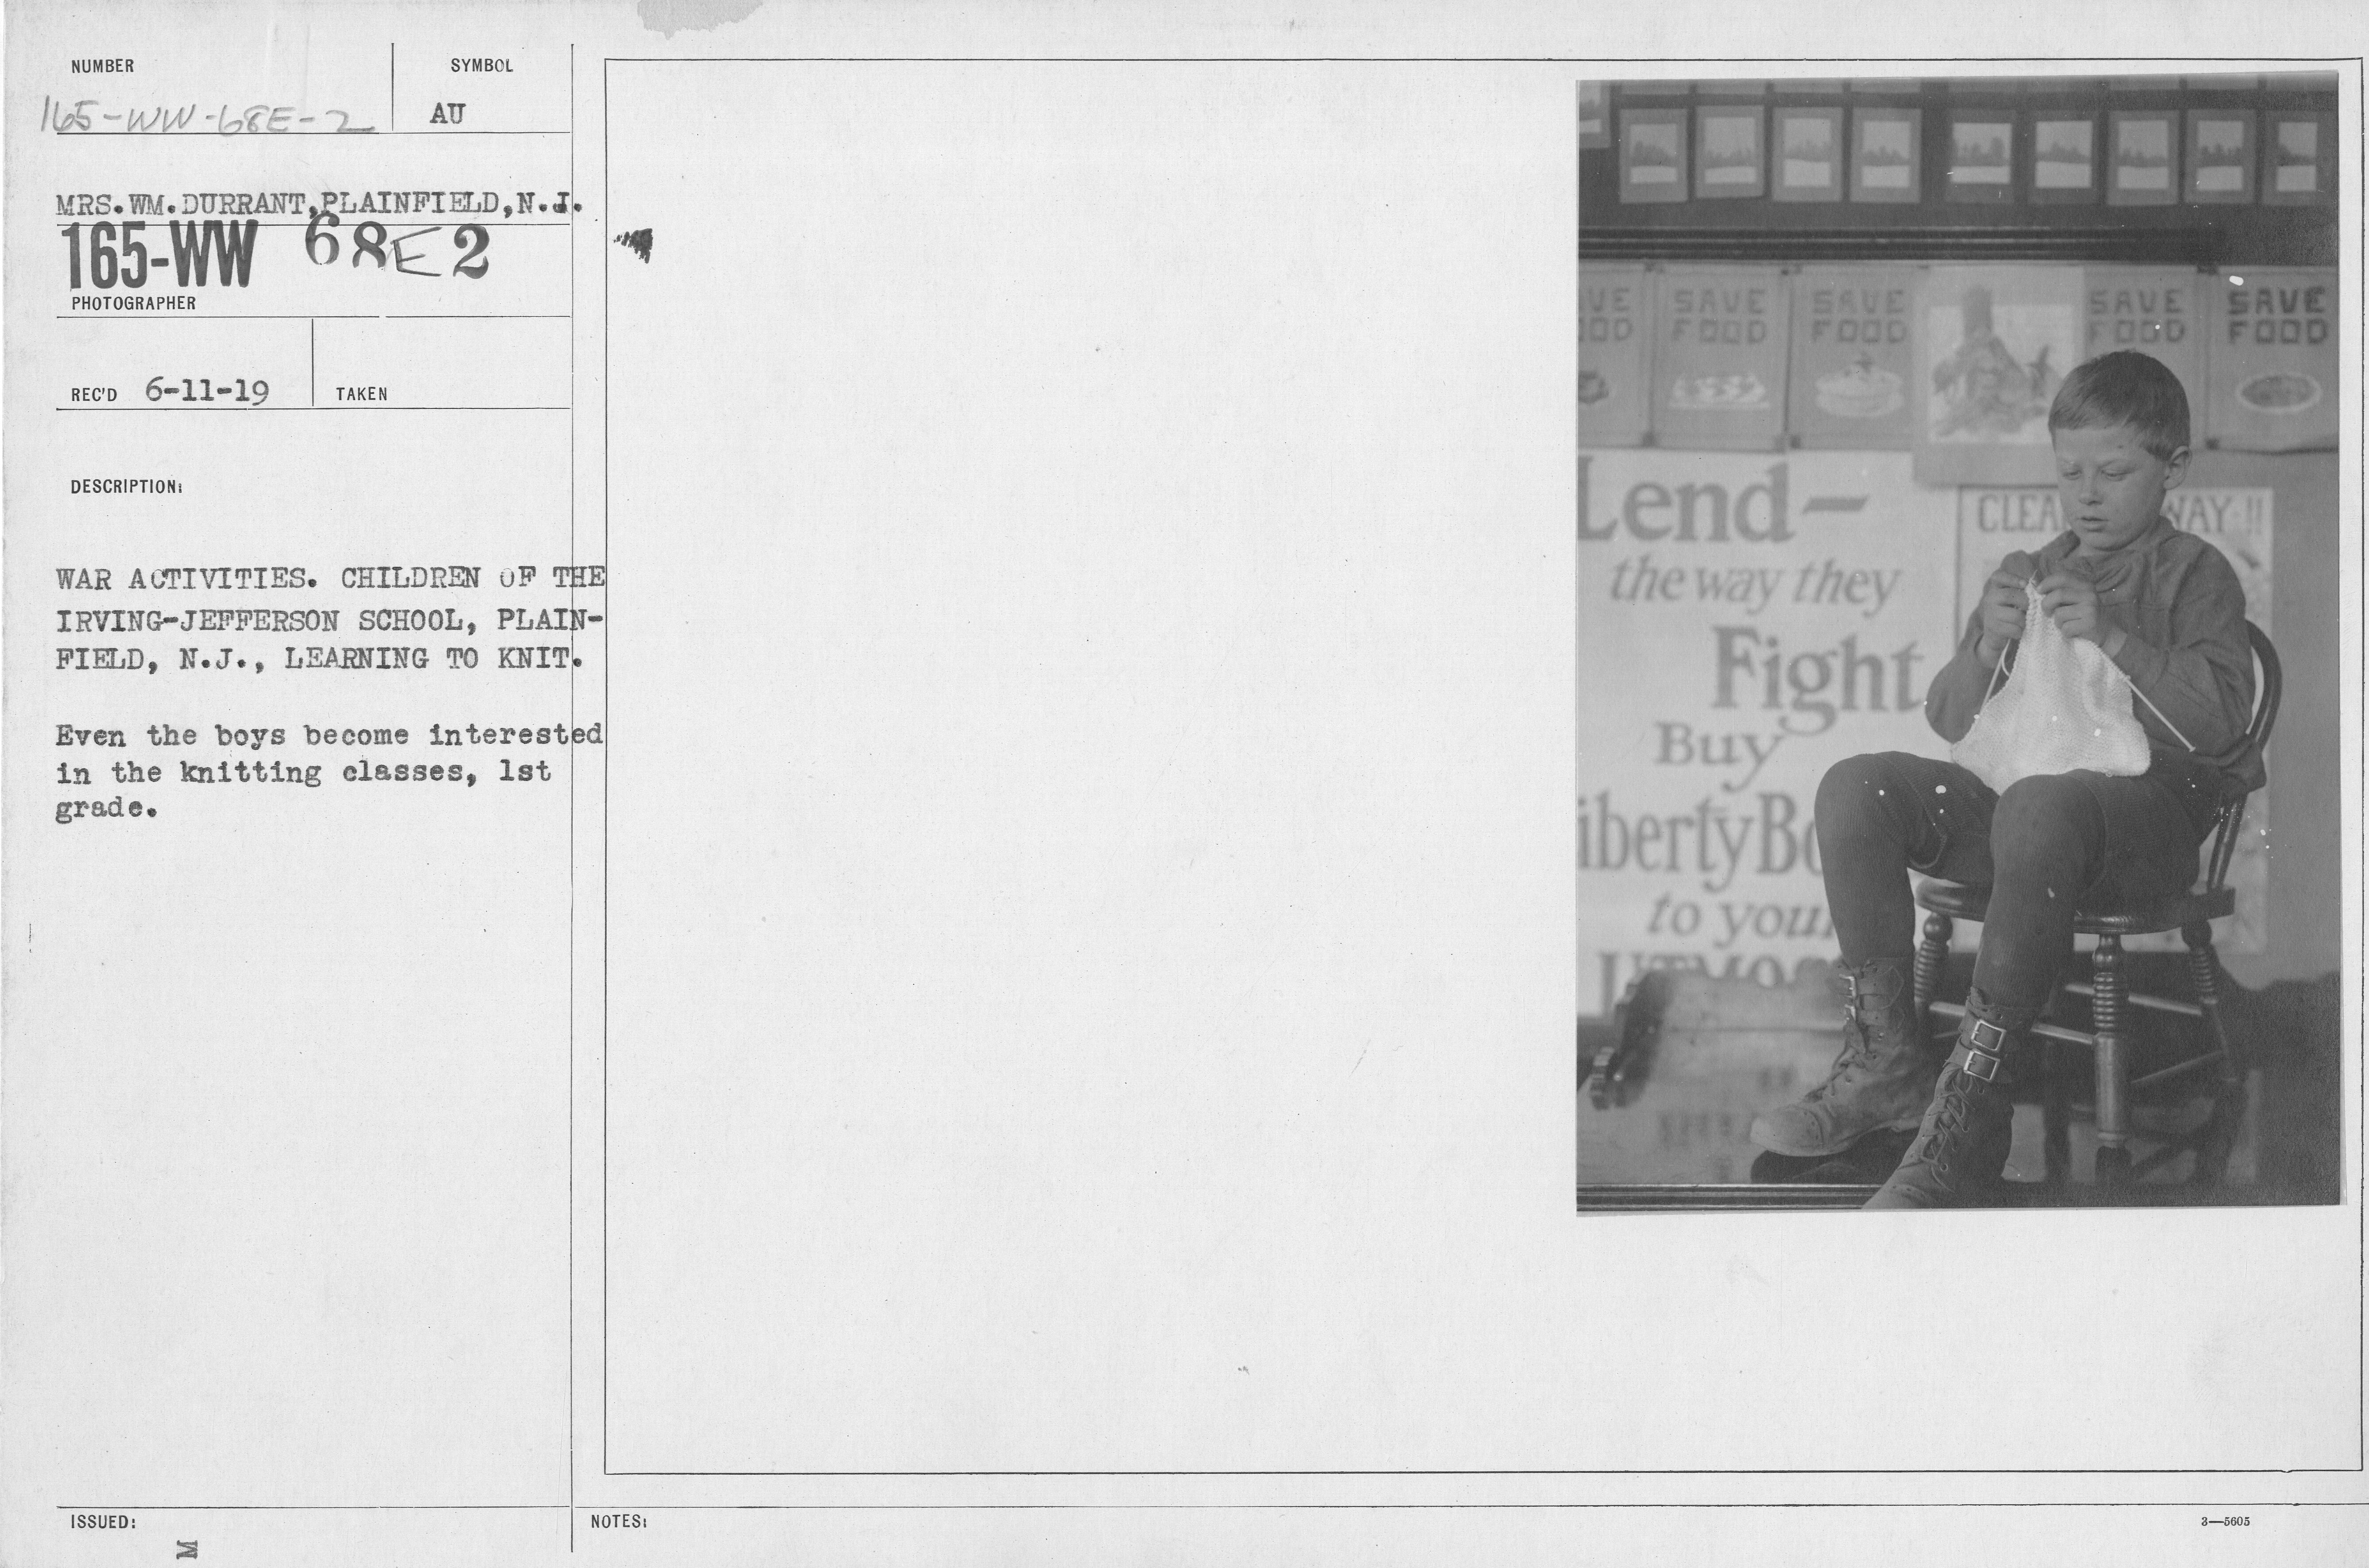 https://nara-media.s3.amazonaws.com/stillpix/165-ww/BOX_68/FOLDER_E/165-WW-68E-002.jpg